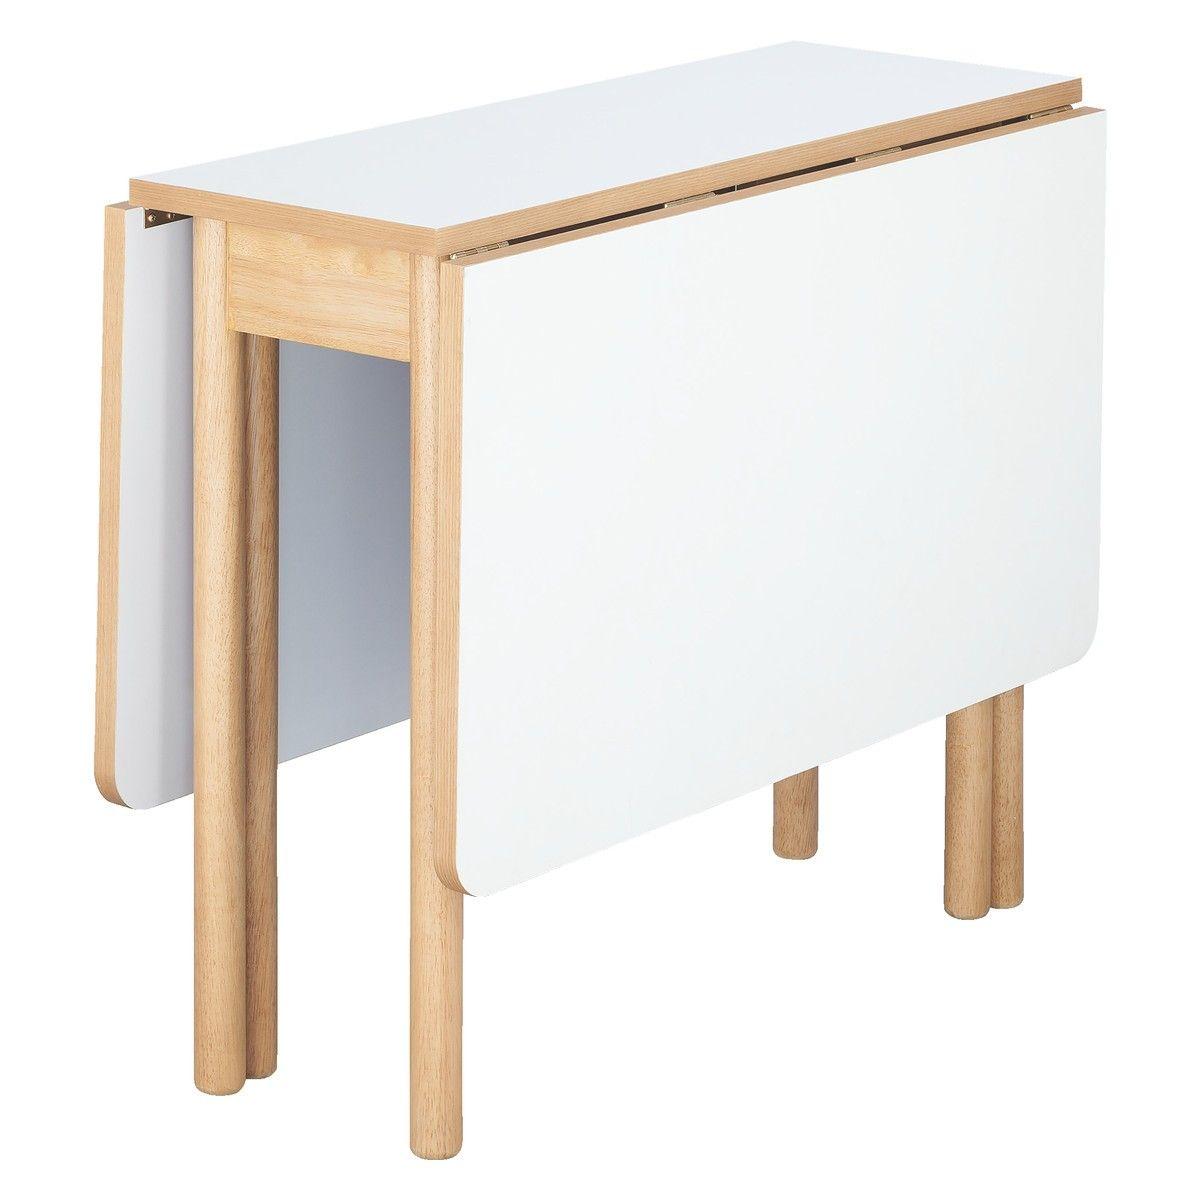 Suki 2 6 Seat White Folding Dining Table Folding Dining Table Wood Folding Table Table